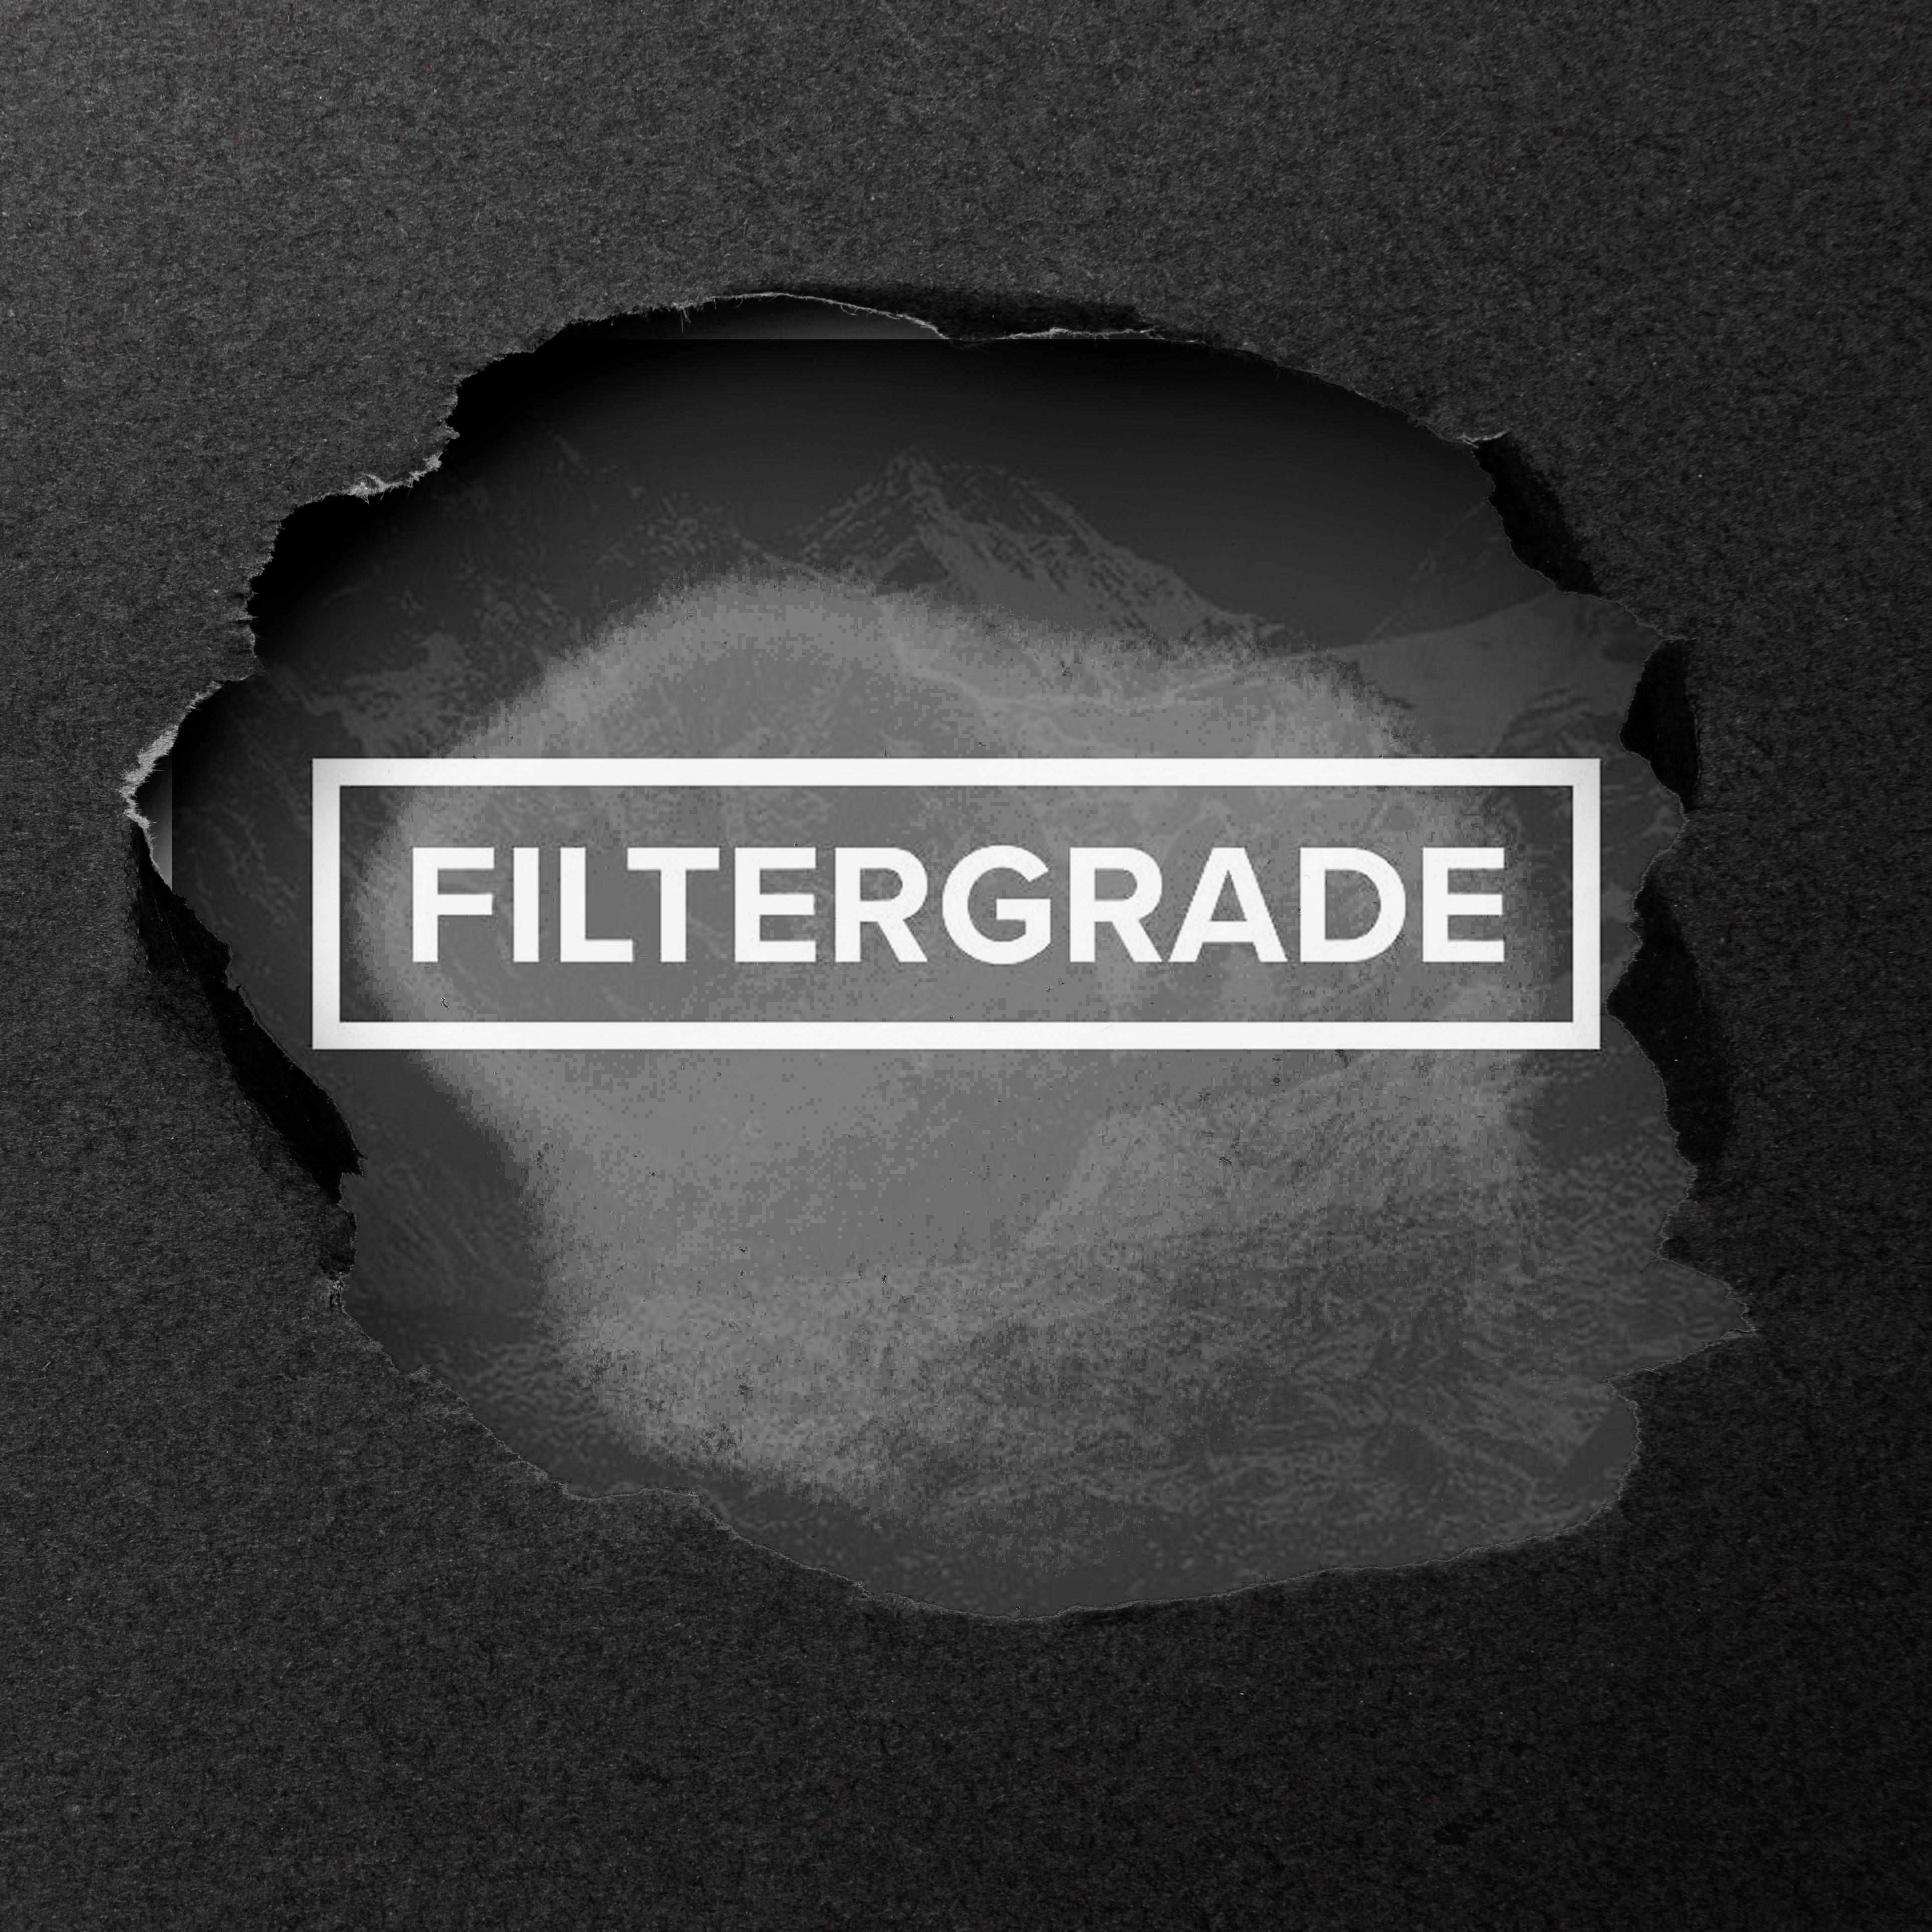 My FilterGrade Store